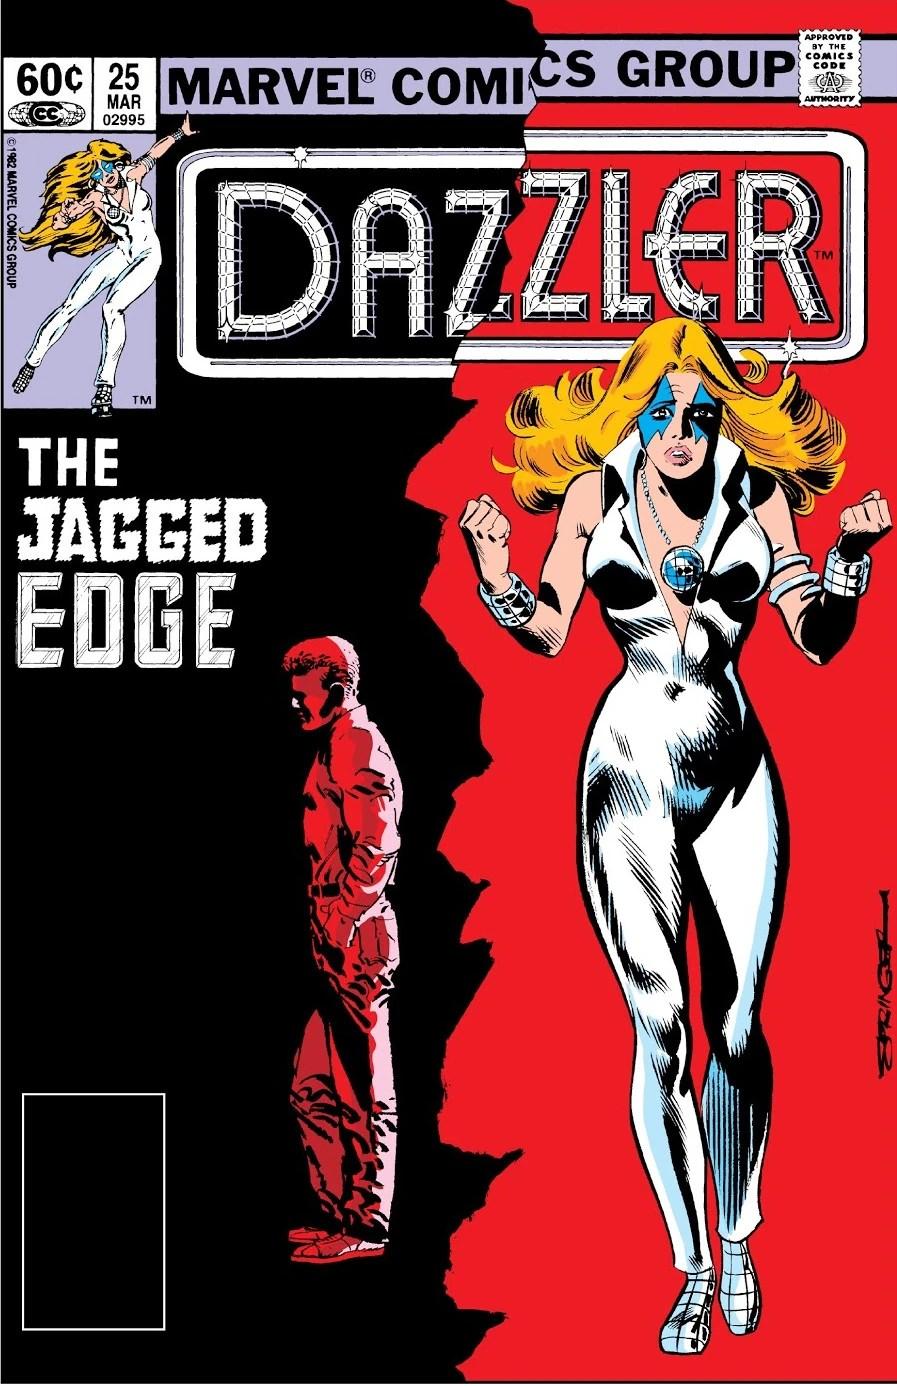 The Jagged Edge